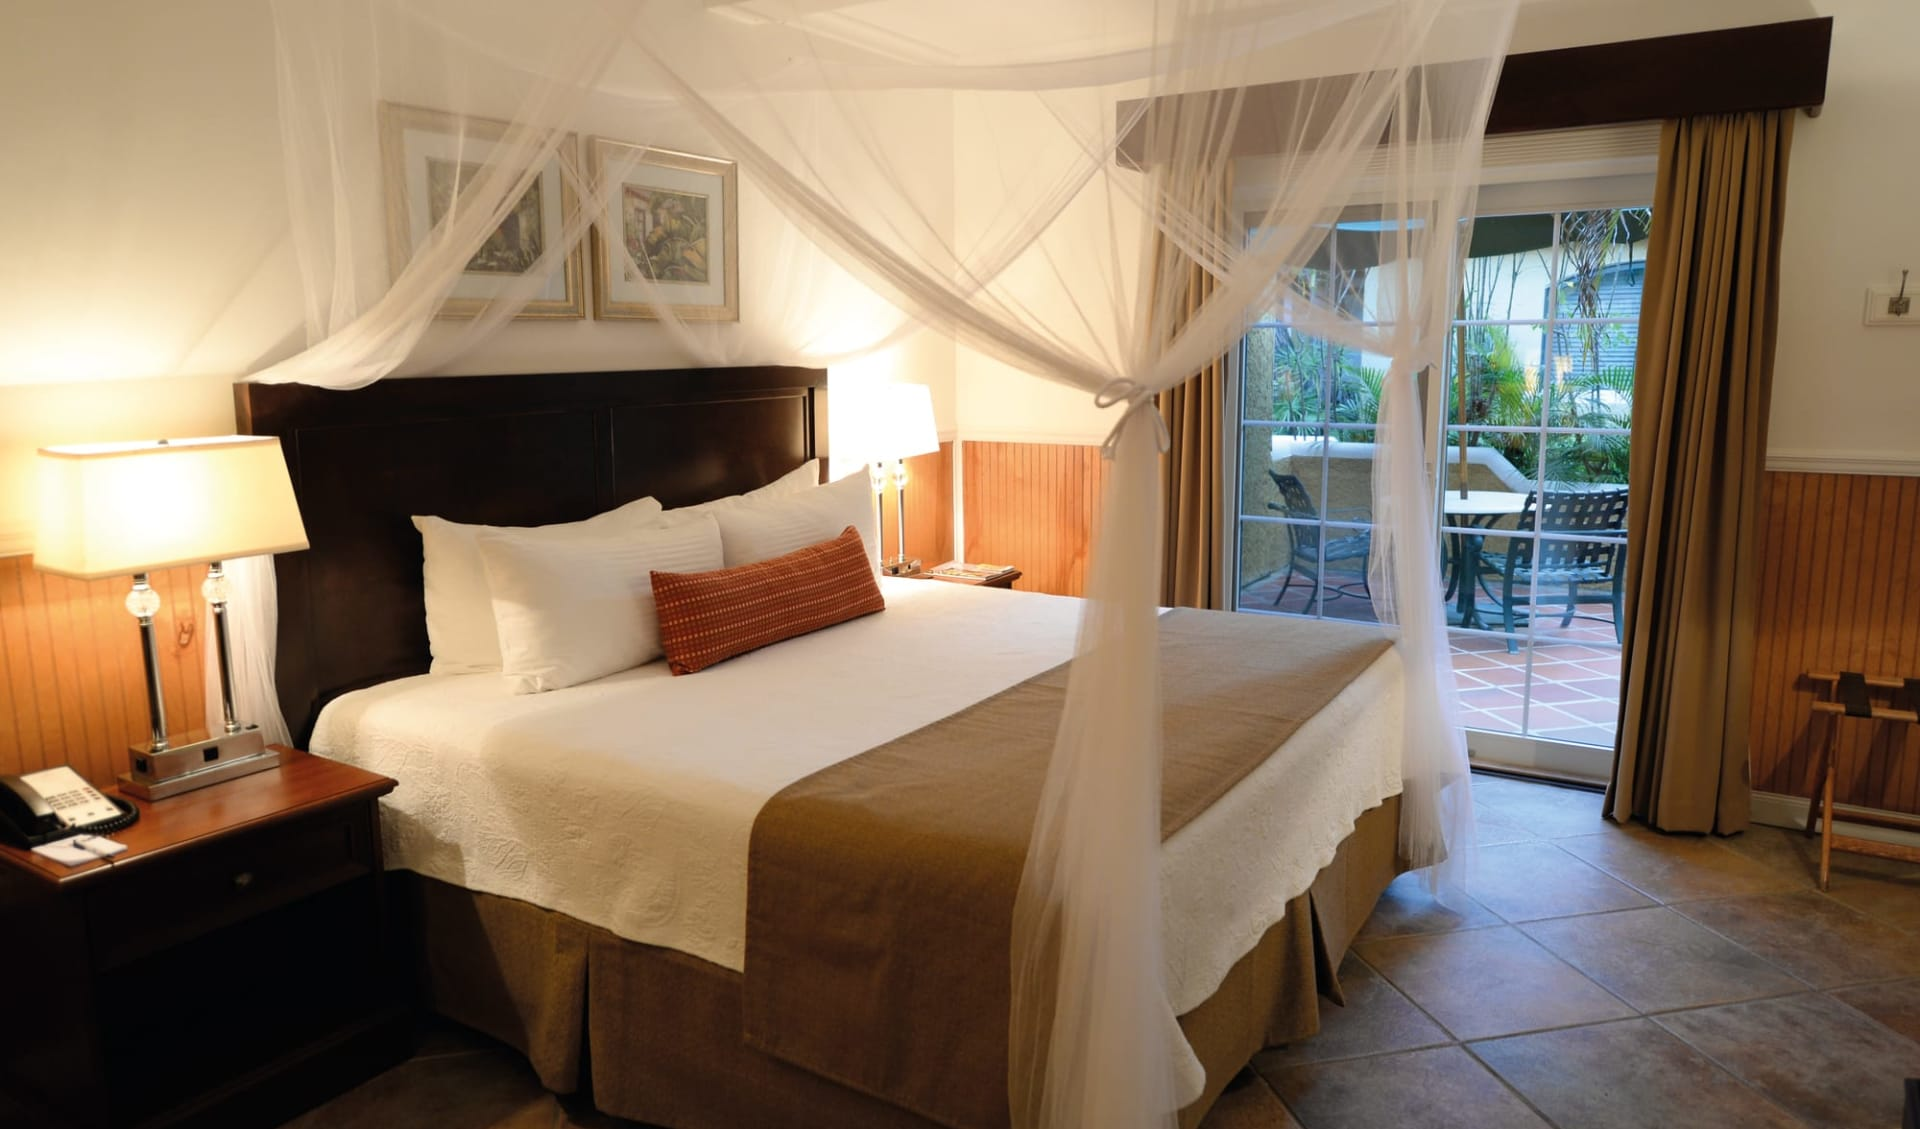 Harbour Village Beach Club Hotel in Bonaire:  Zimmer Harbour Village Beach Club - Gartensicht Doppel Zimmer C Harbour Village Beach Club